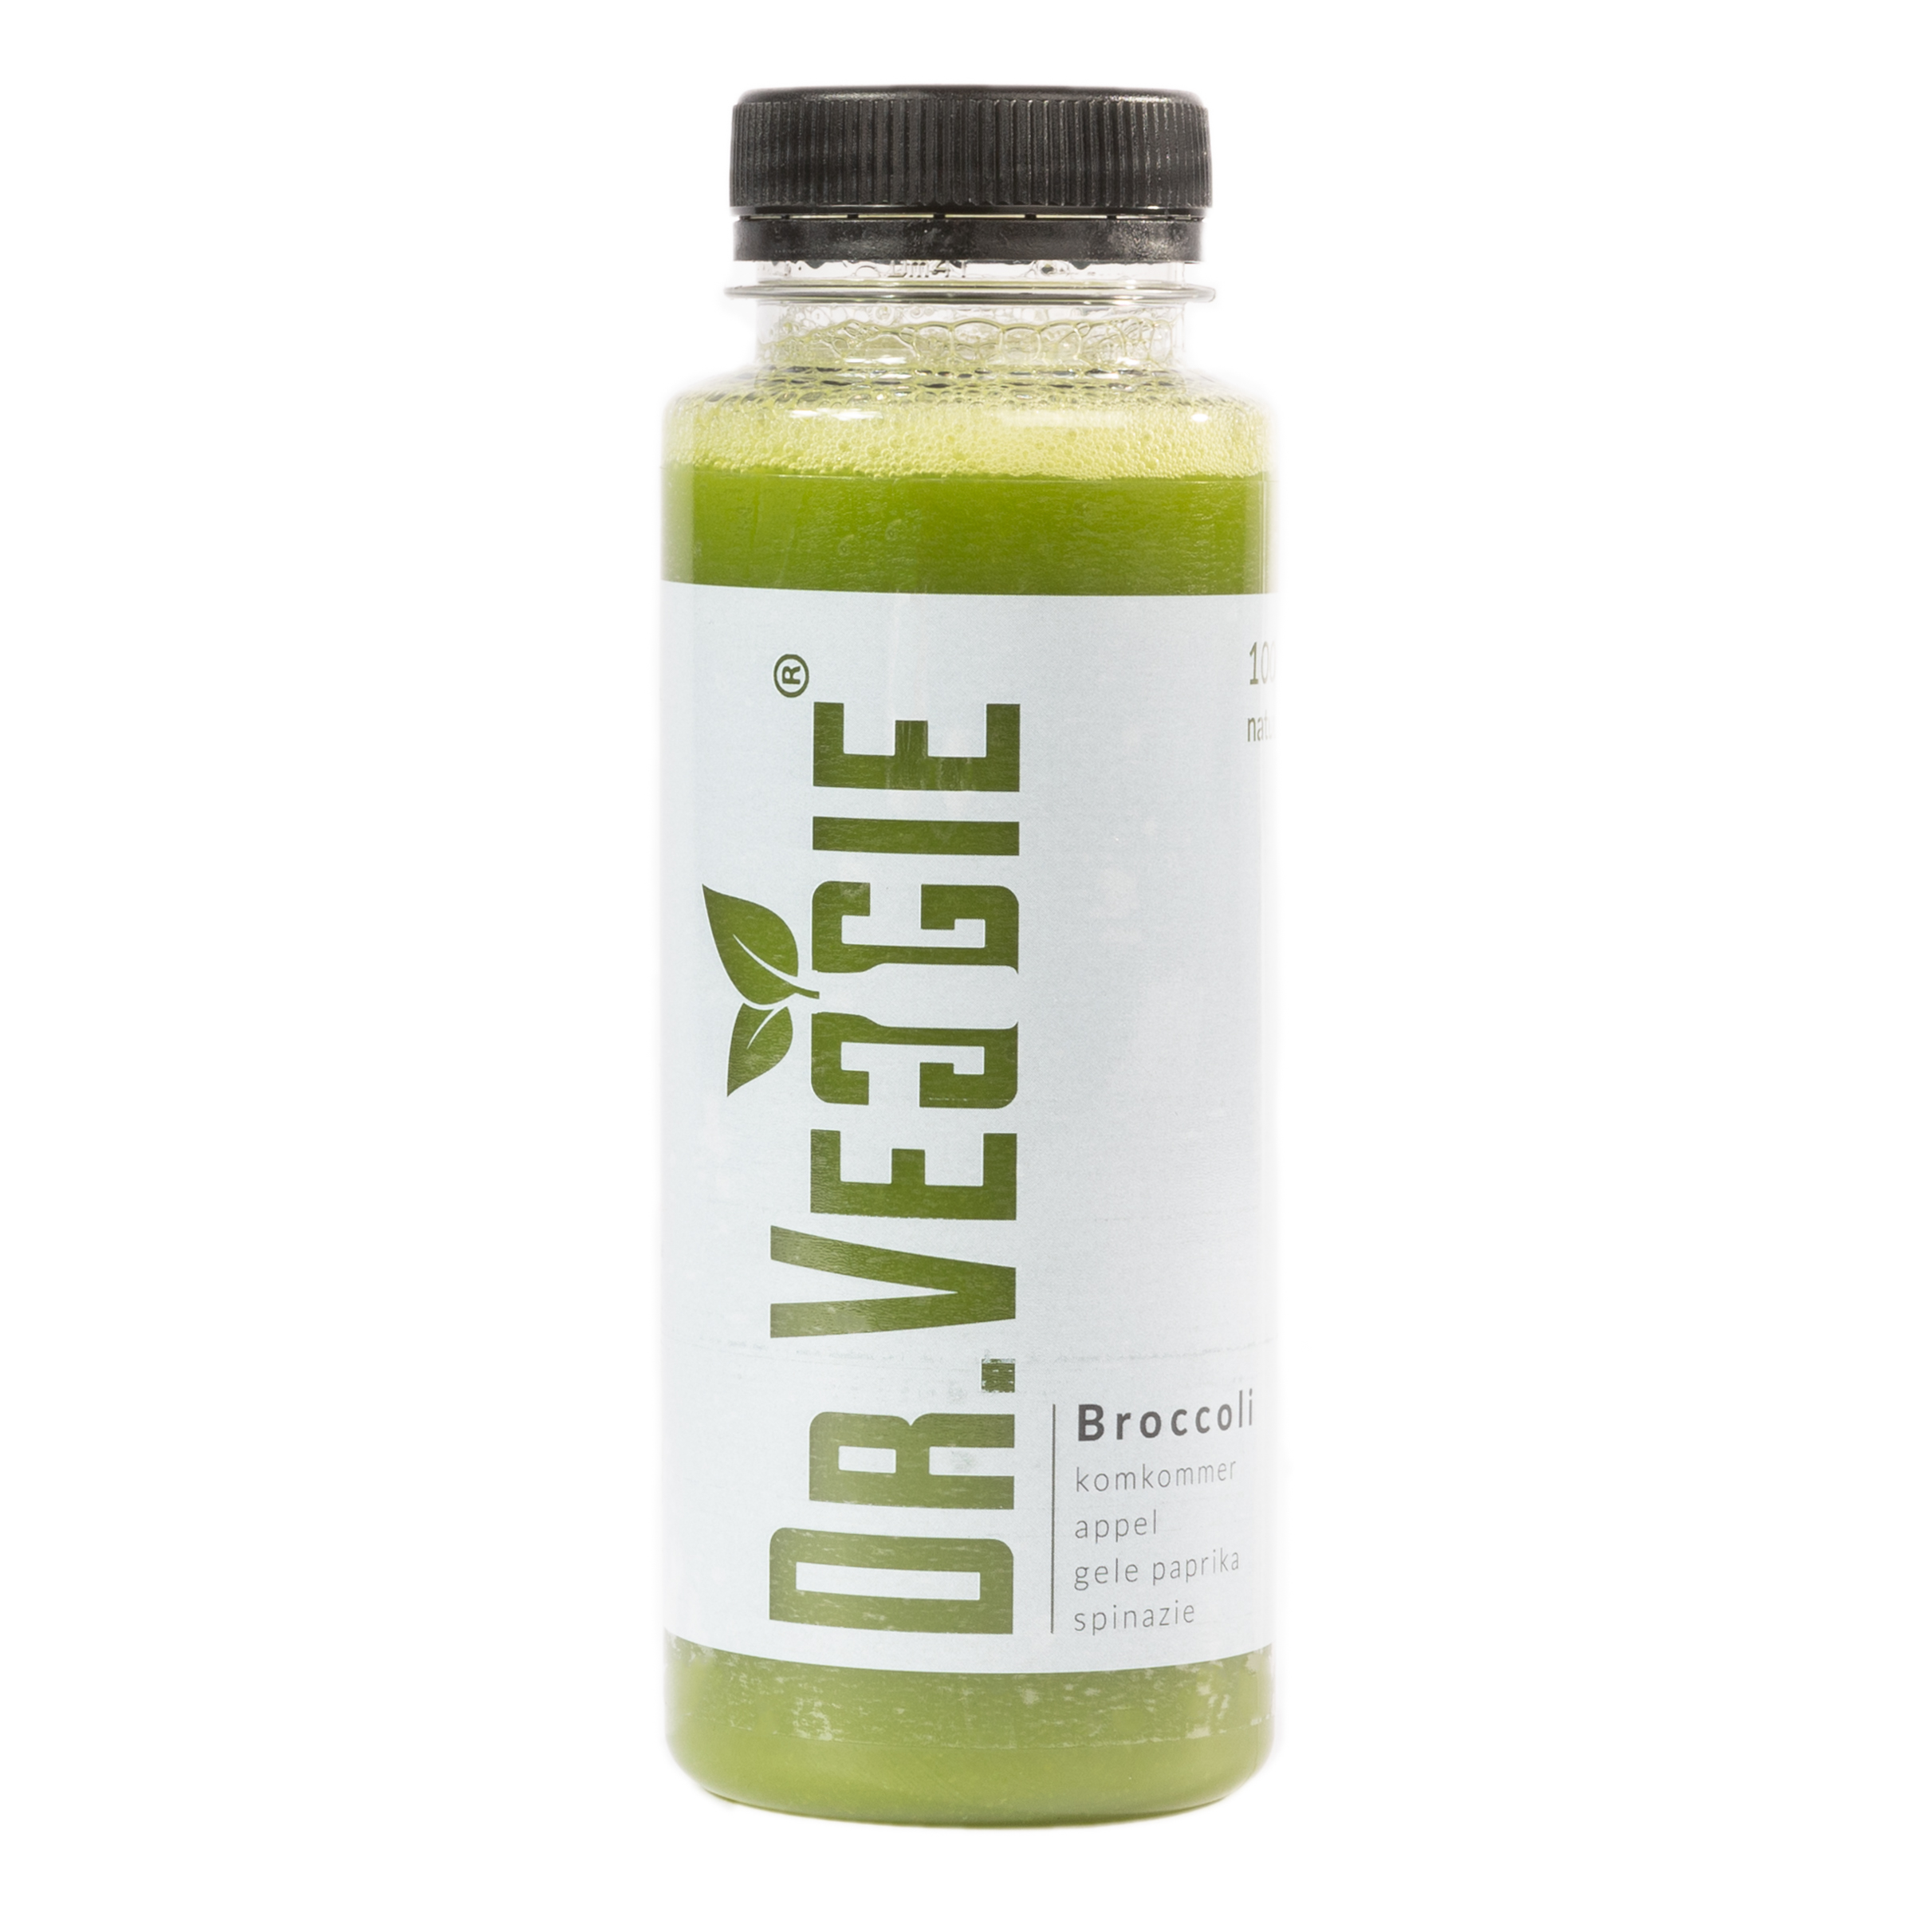 Groentesap broccoli ingredient Dr Veggie